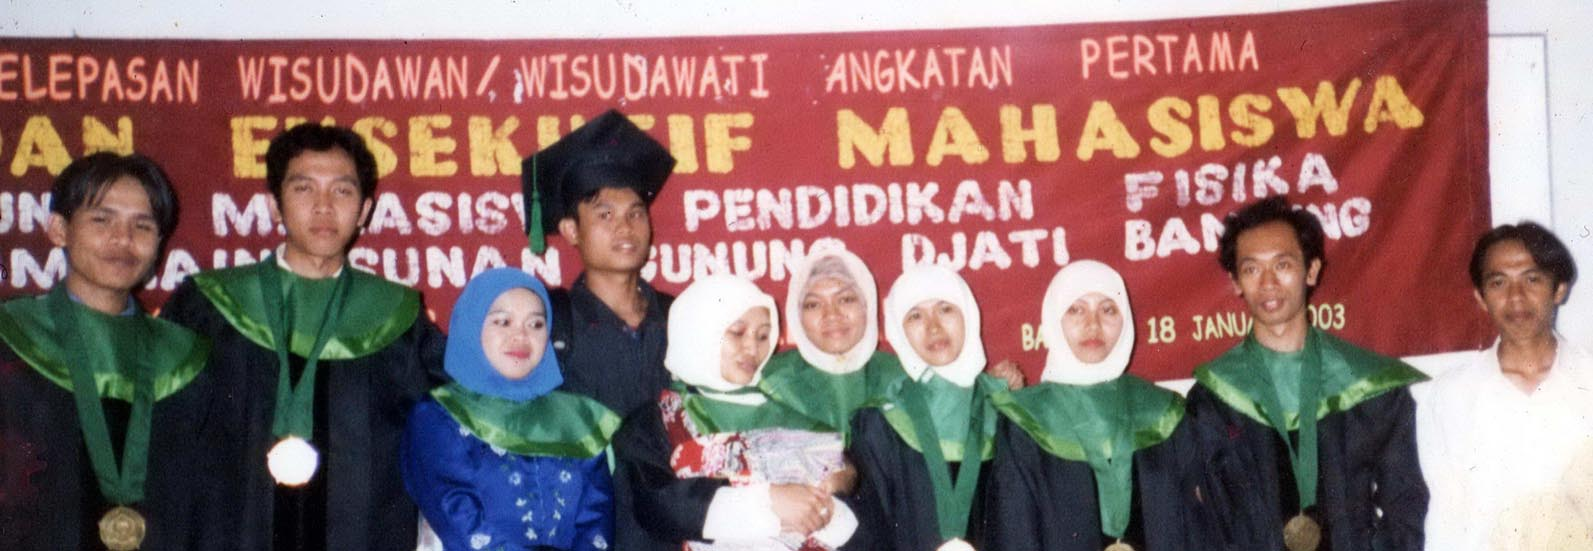 Foto bersama pasca wisuda